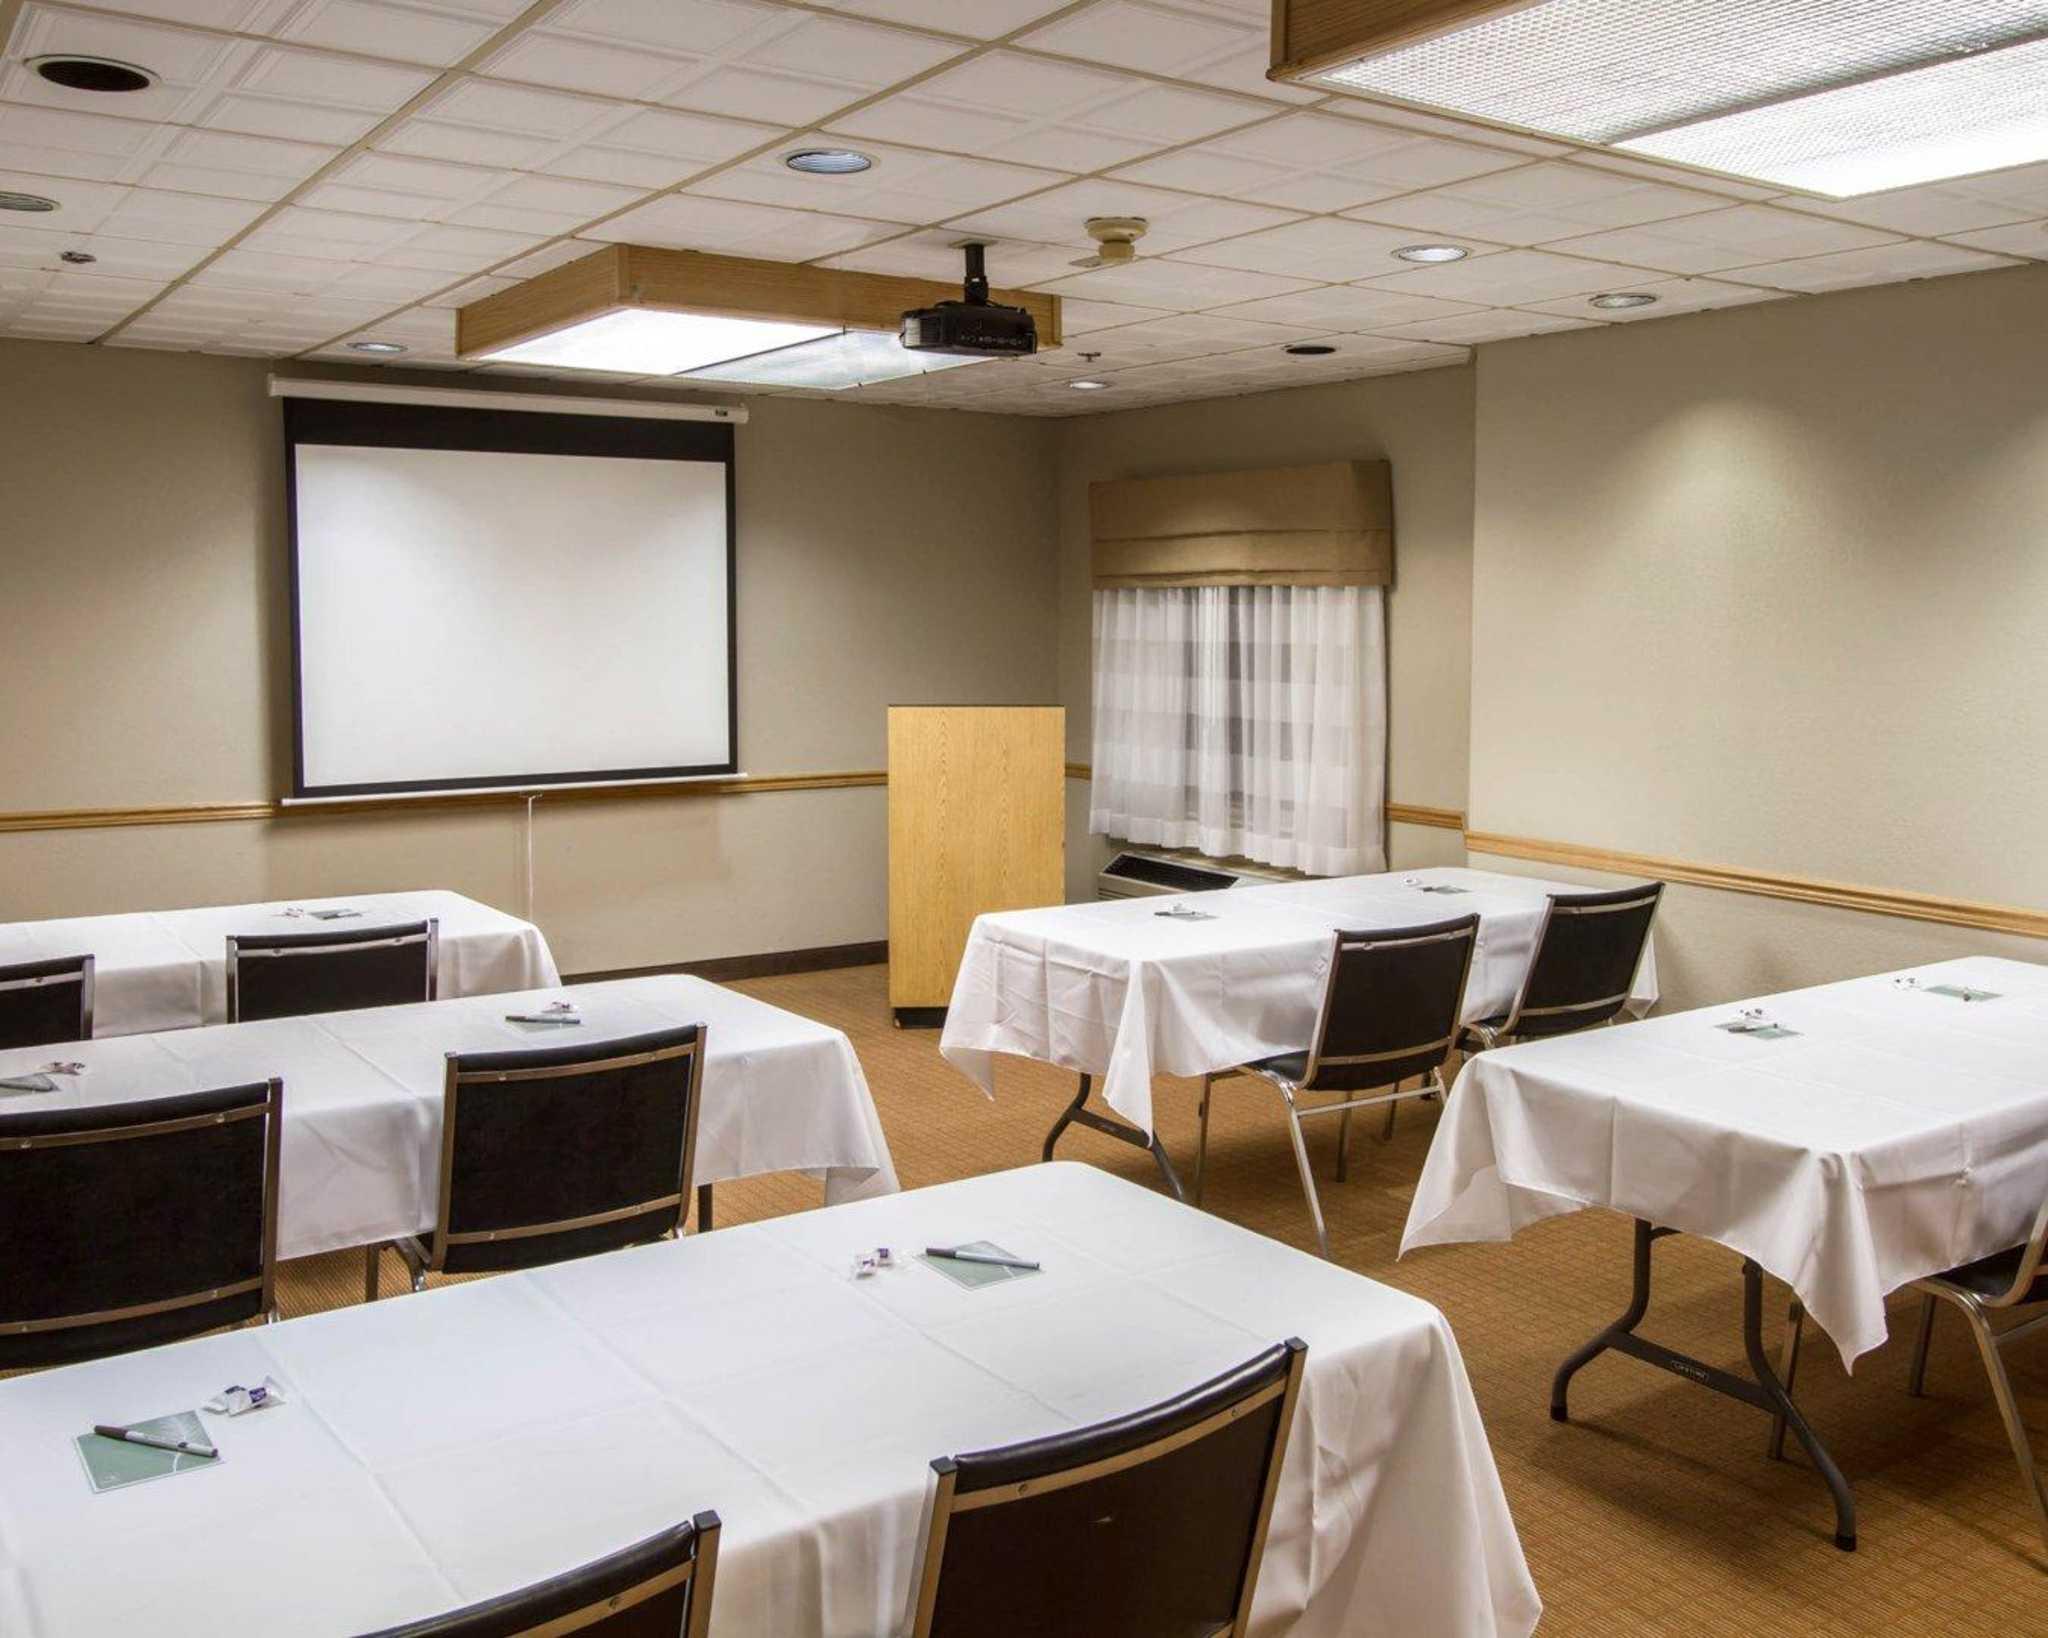 Sleep Inn & Suites Buffalo Airport image 16